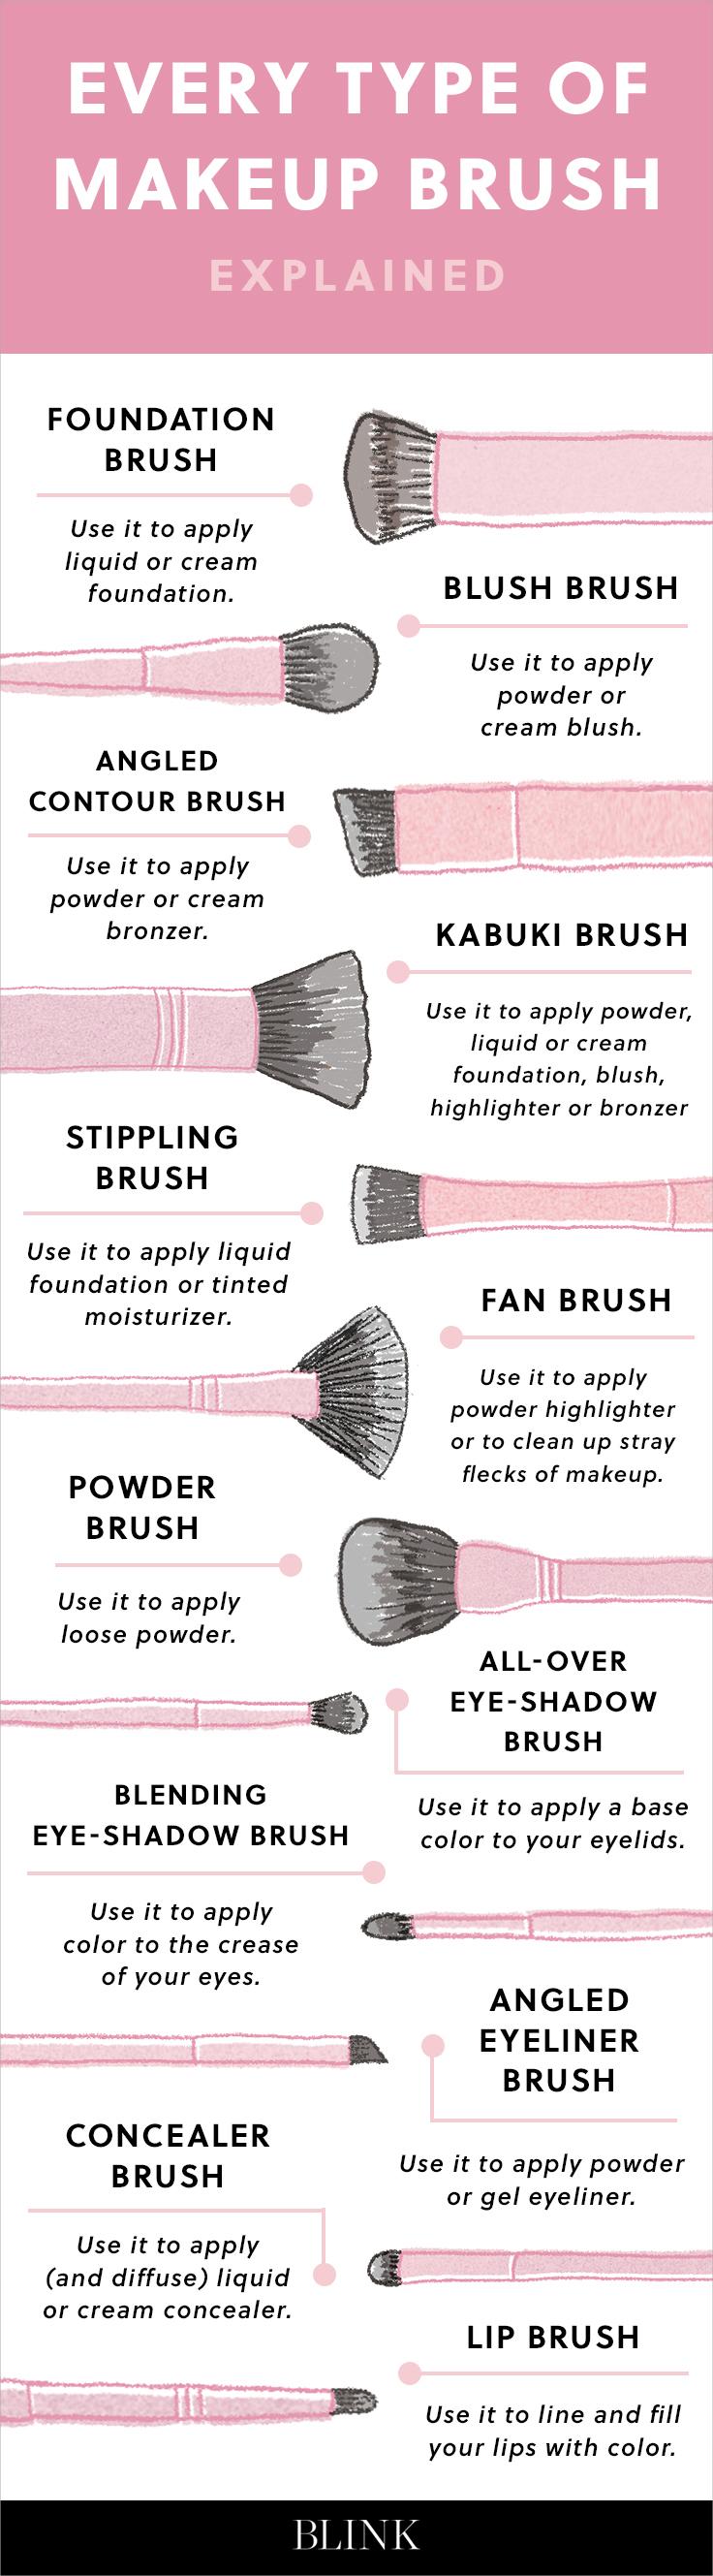 Every Type of Makeup Brush.jpg